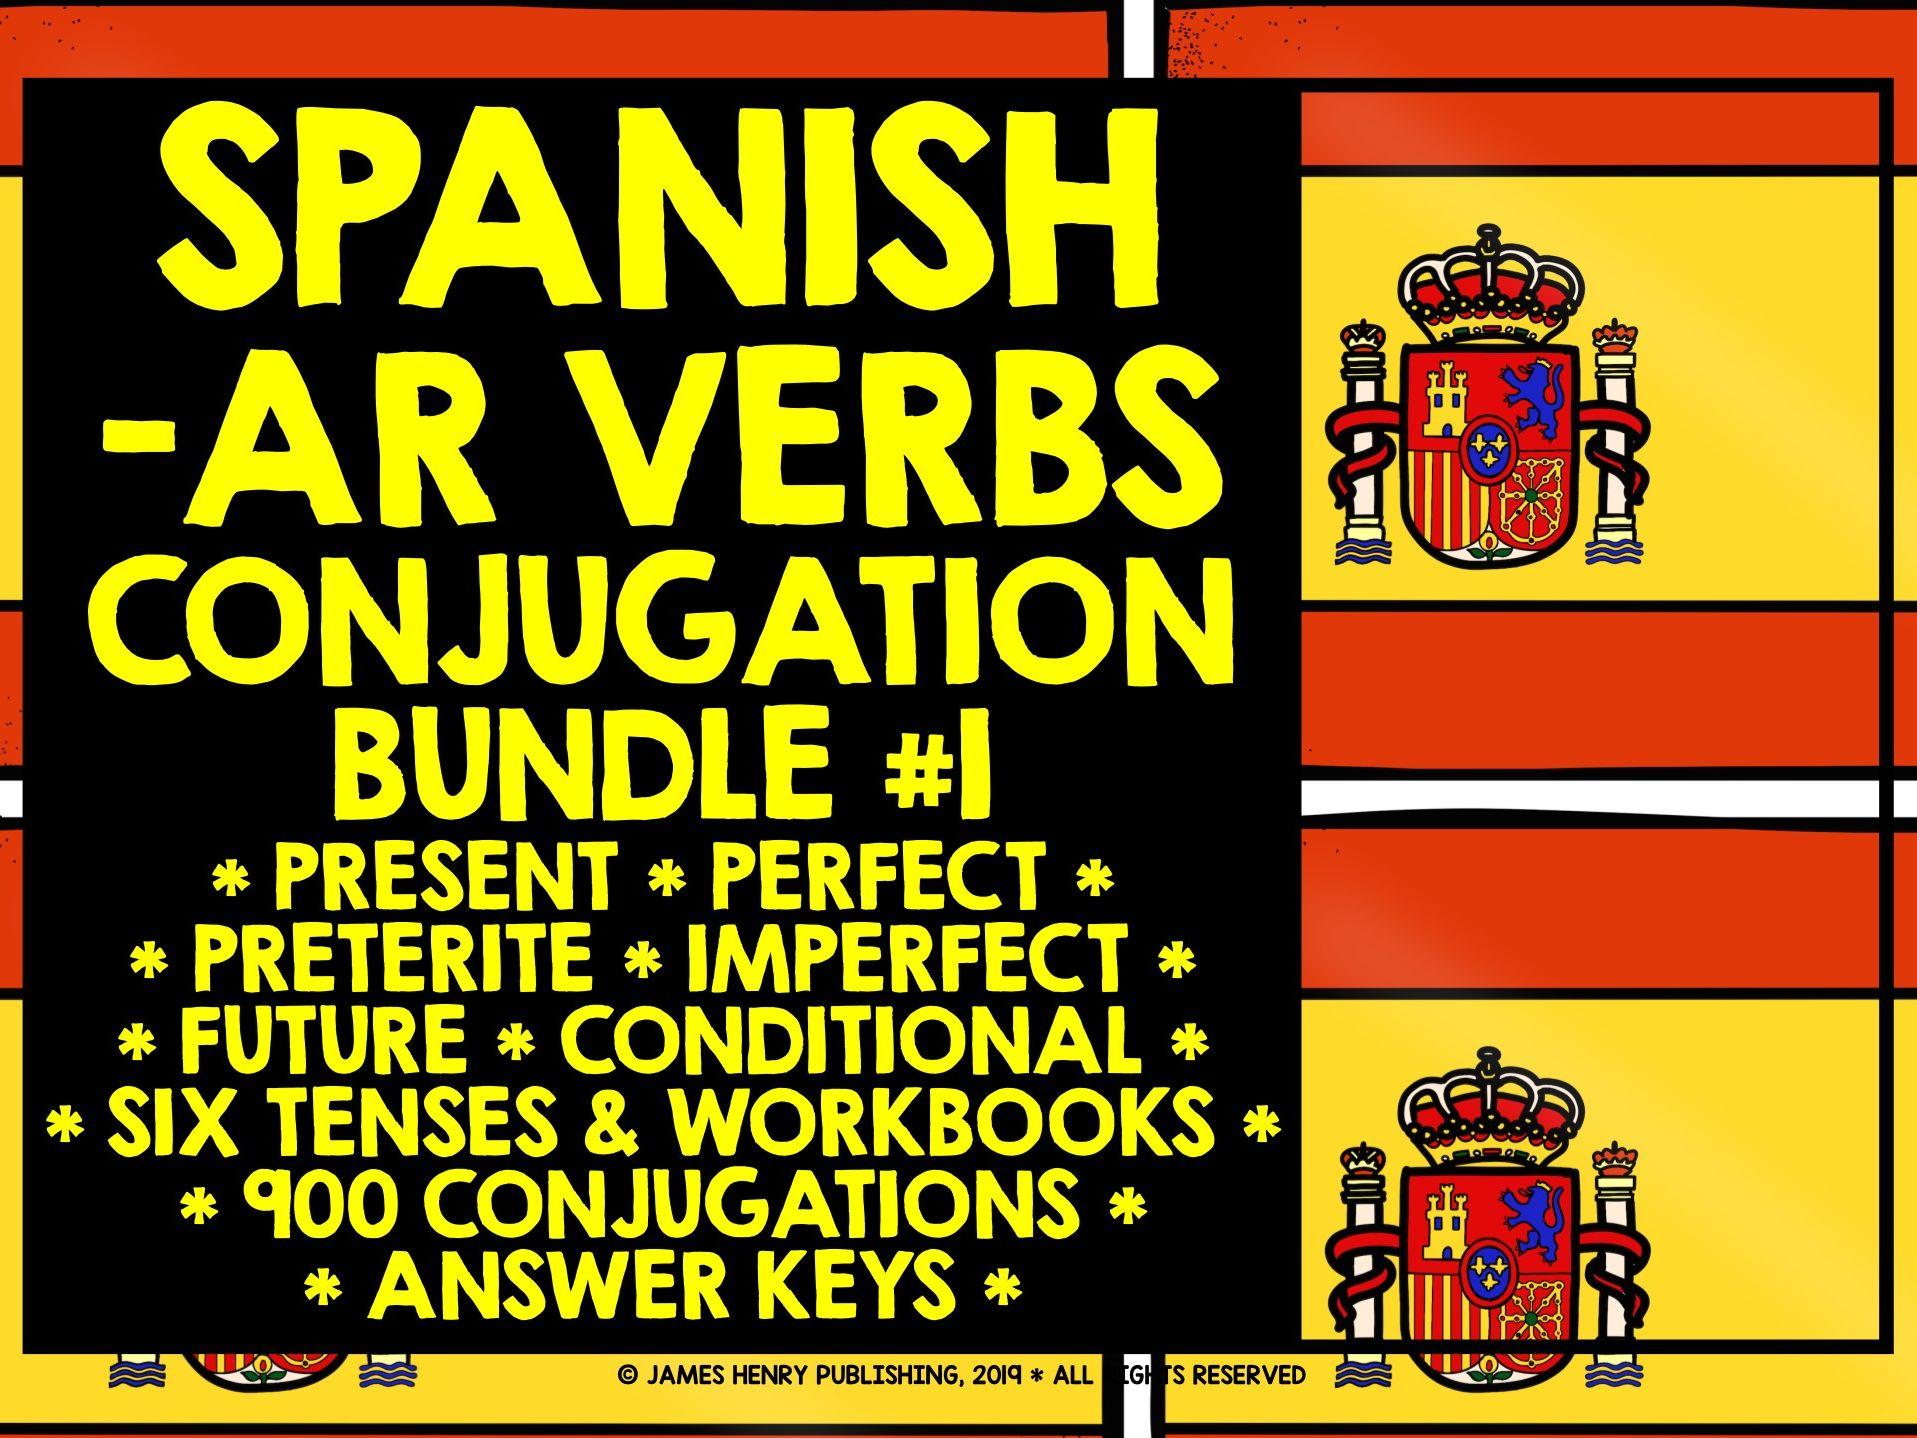 SPANISH -AR VERBS CONJUGATION BUNDLE #1